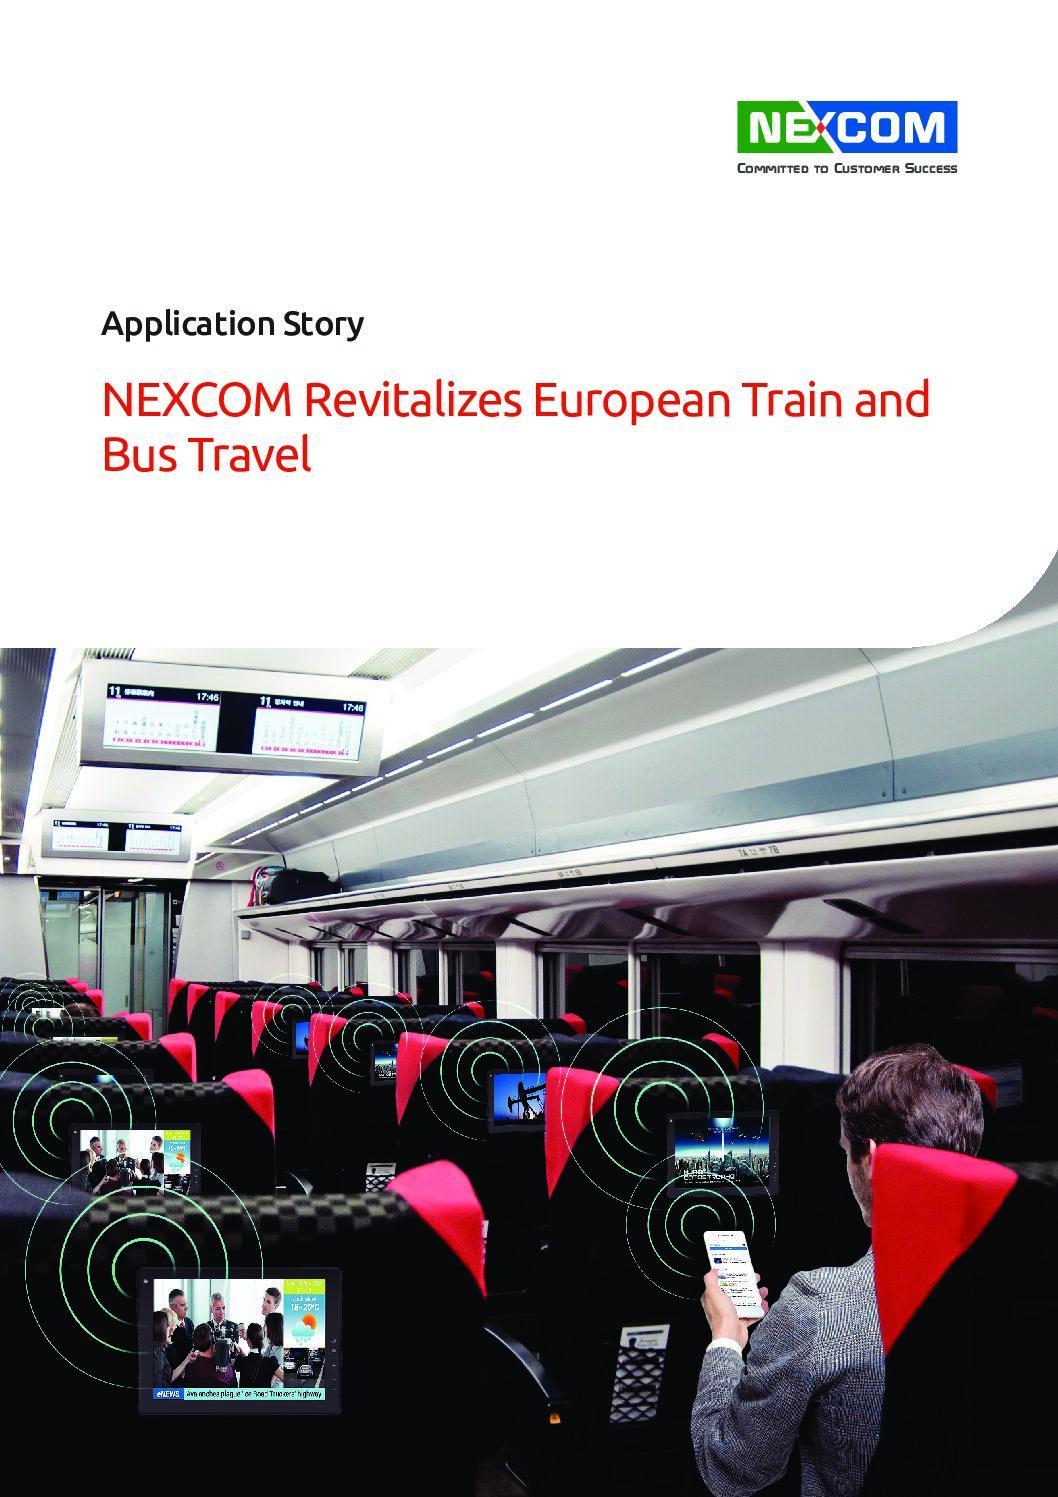 NEXCOM Revitalizes European Train and Bus Travel